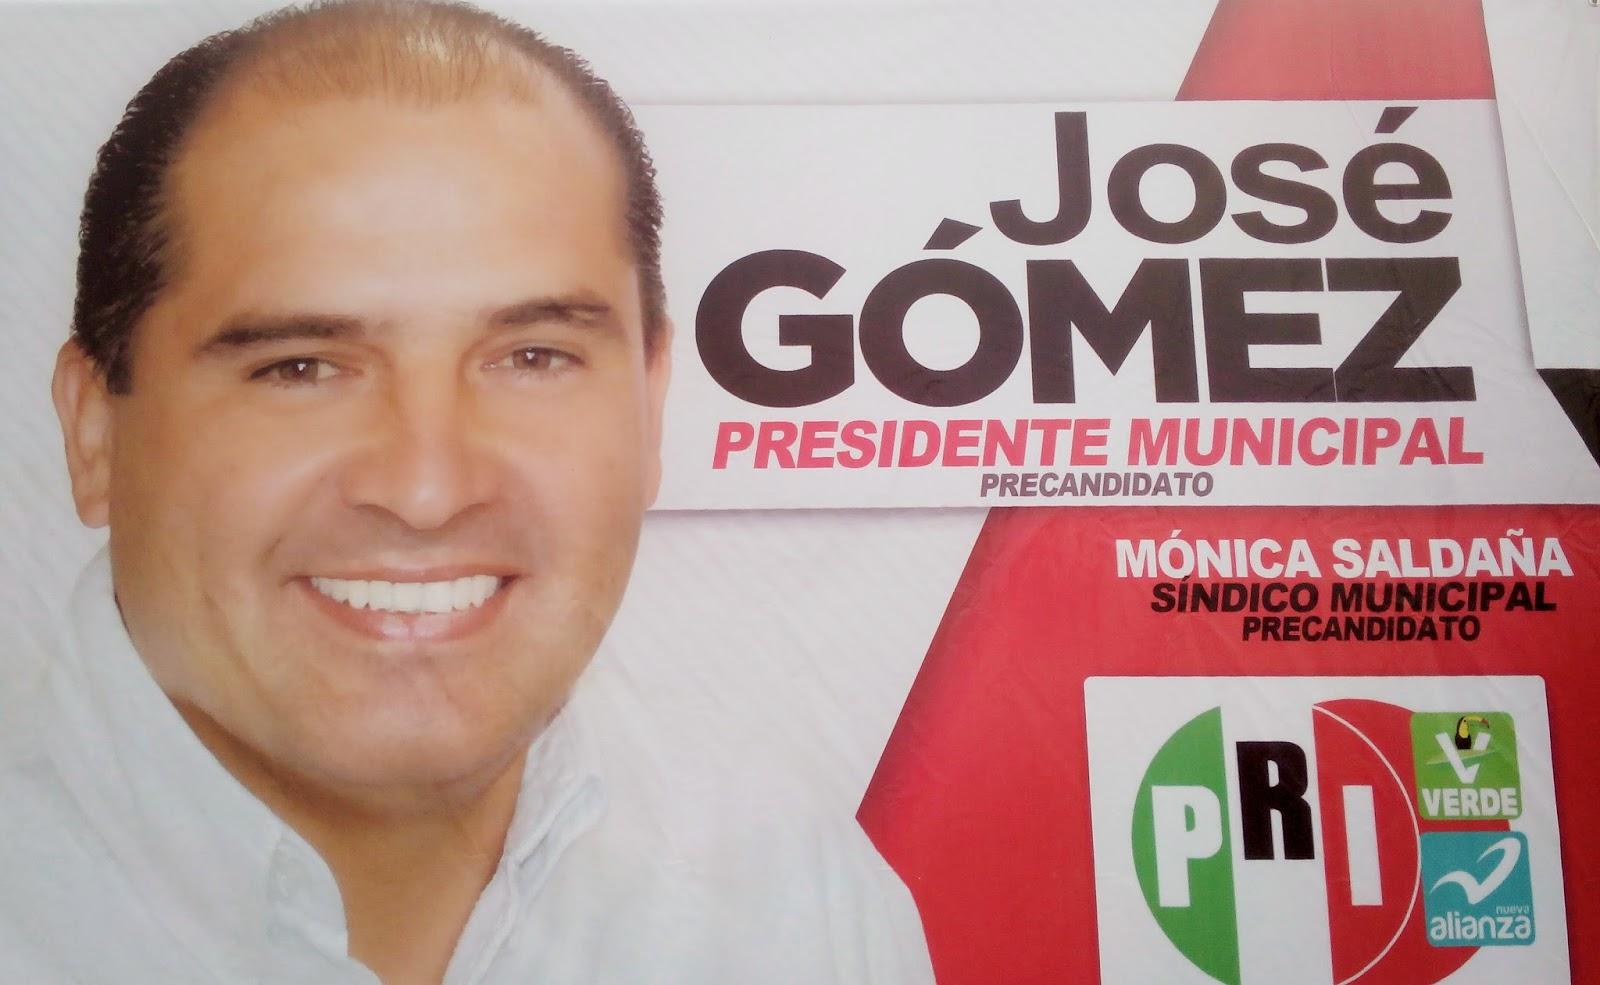 Julio gomez goza con tremendas nalgas - 2 6